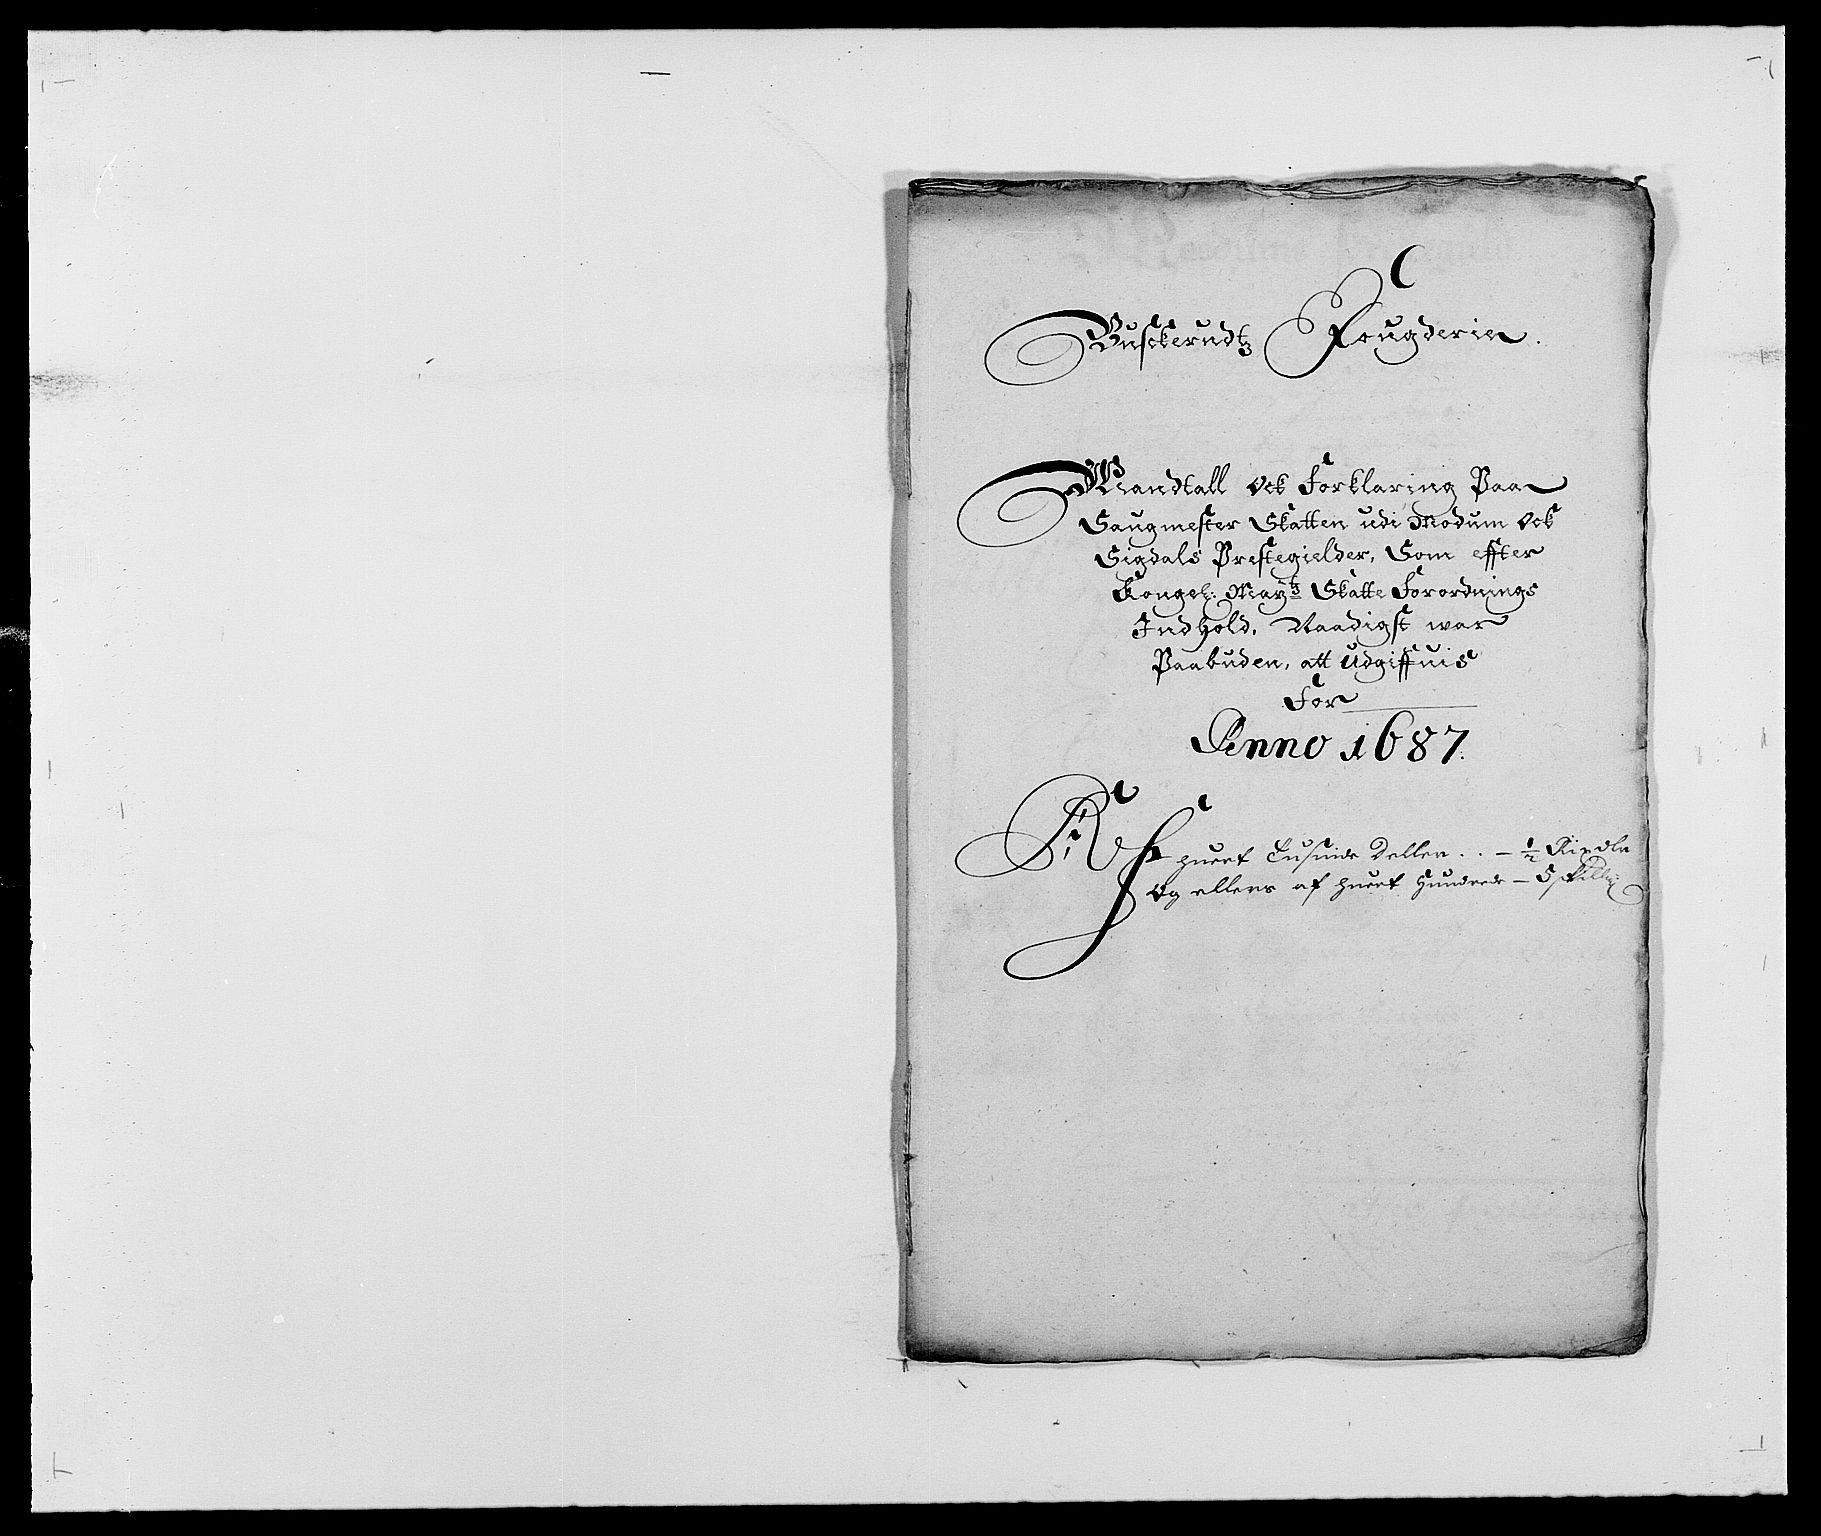 RA, Rentekammeret inntil 1814, Reviderte regnskaper, Fogderegnskap, R25/L1679: Fogderegnskap Buskerud, 1687-1688, s. 203